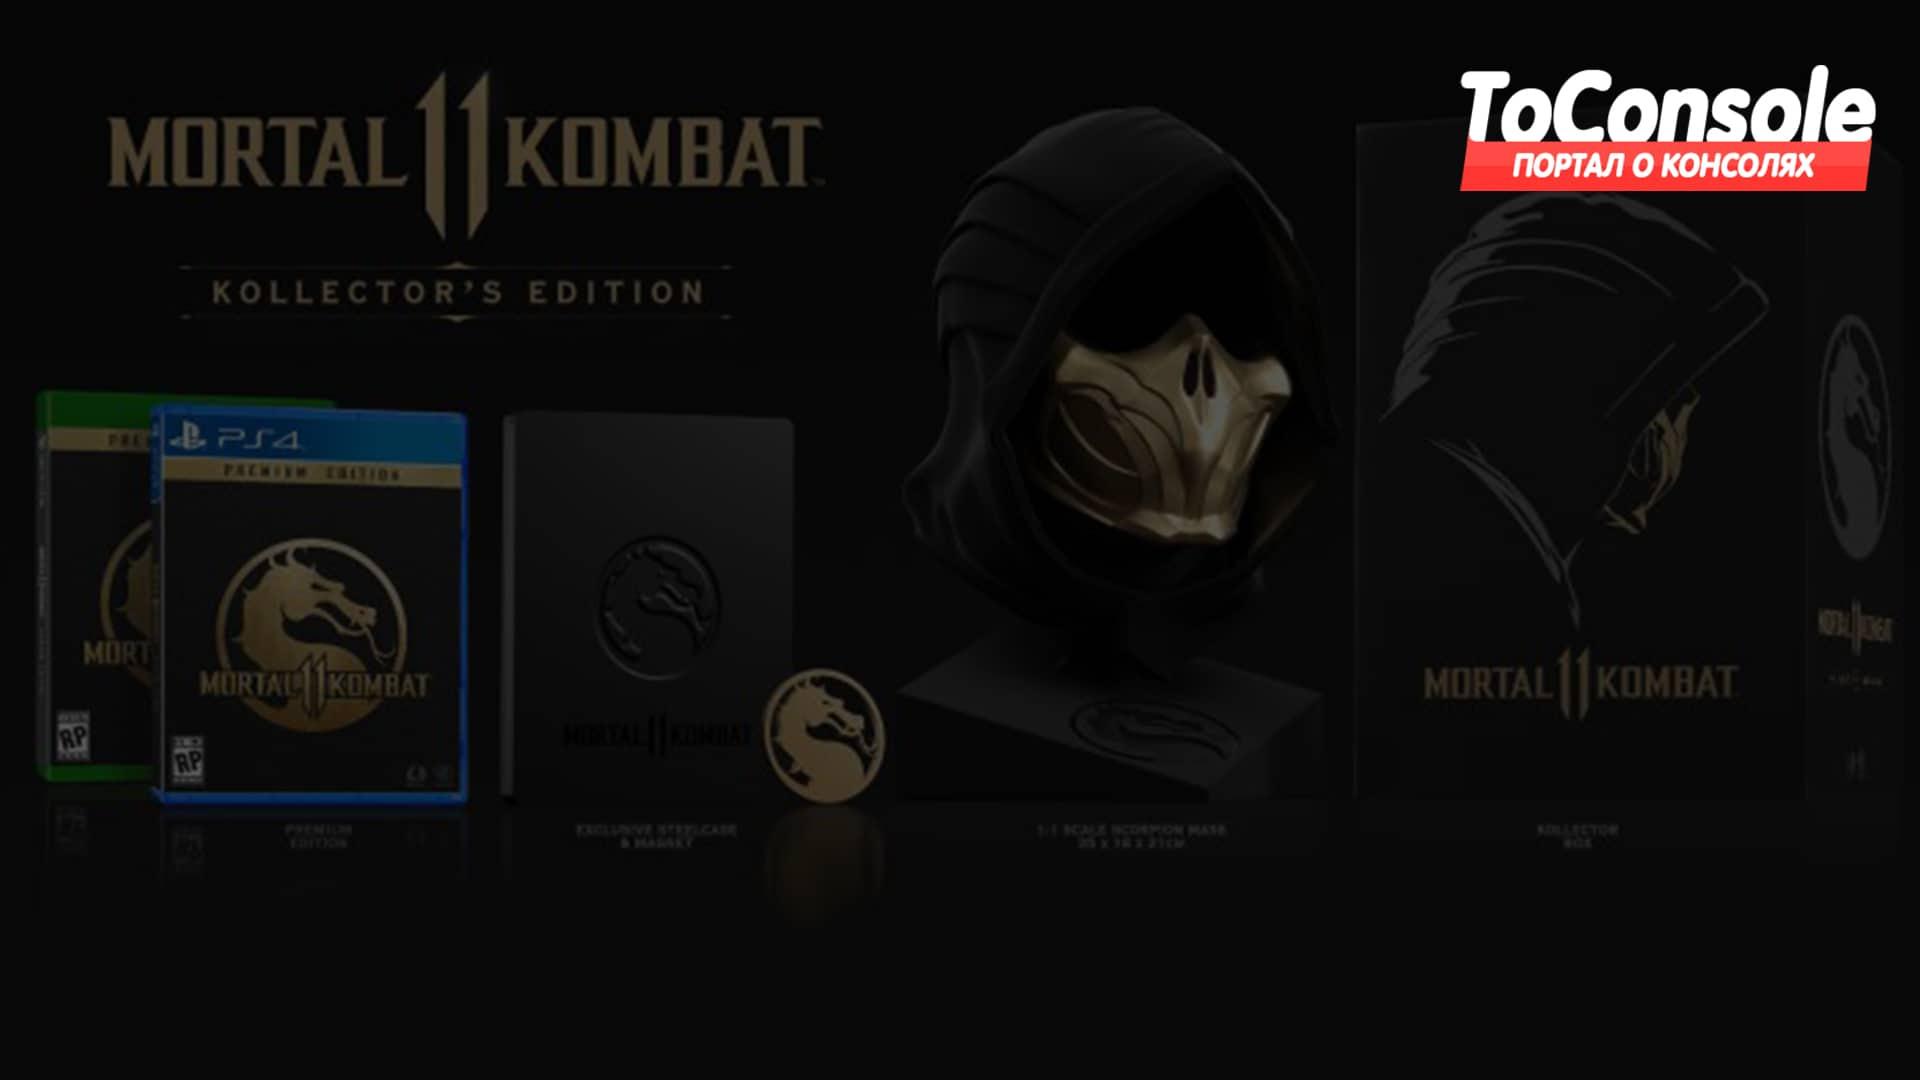 mortal kombat 11 доступна для предзаказа